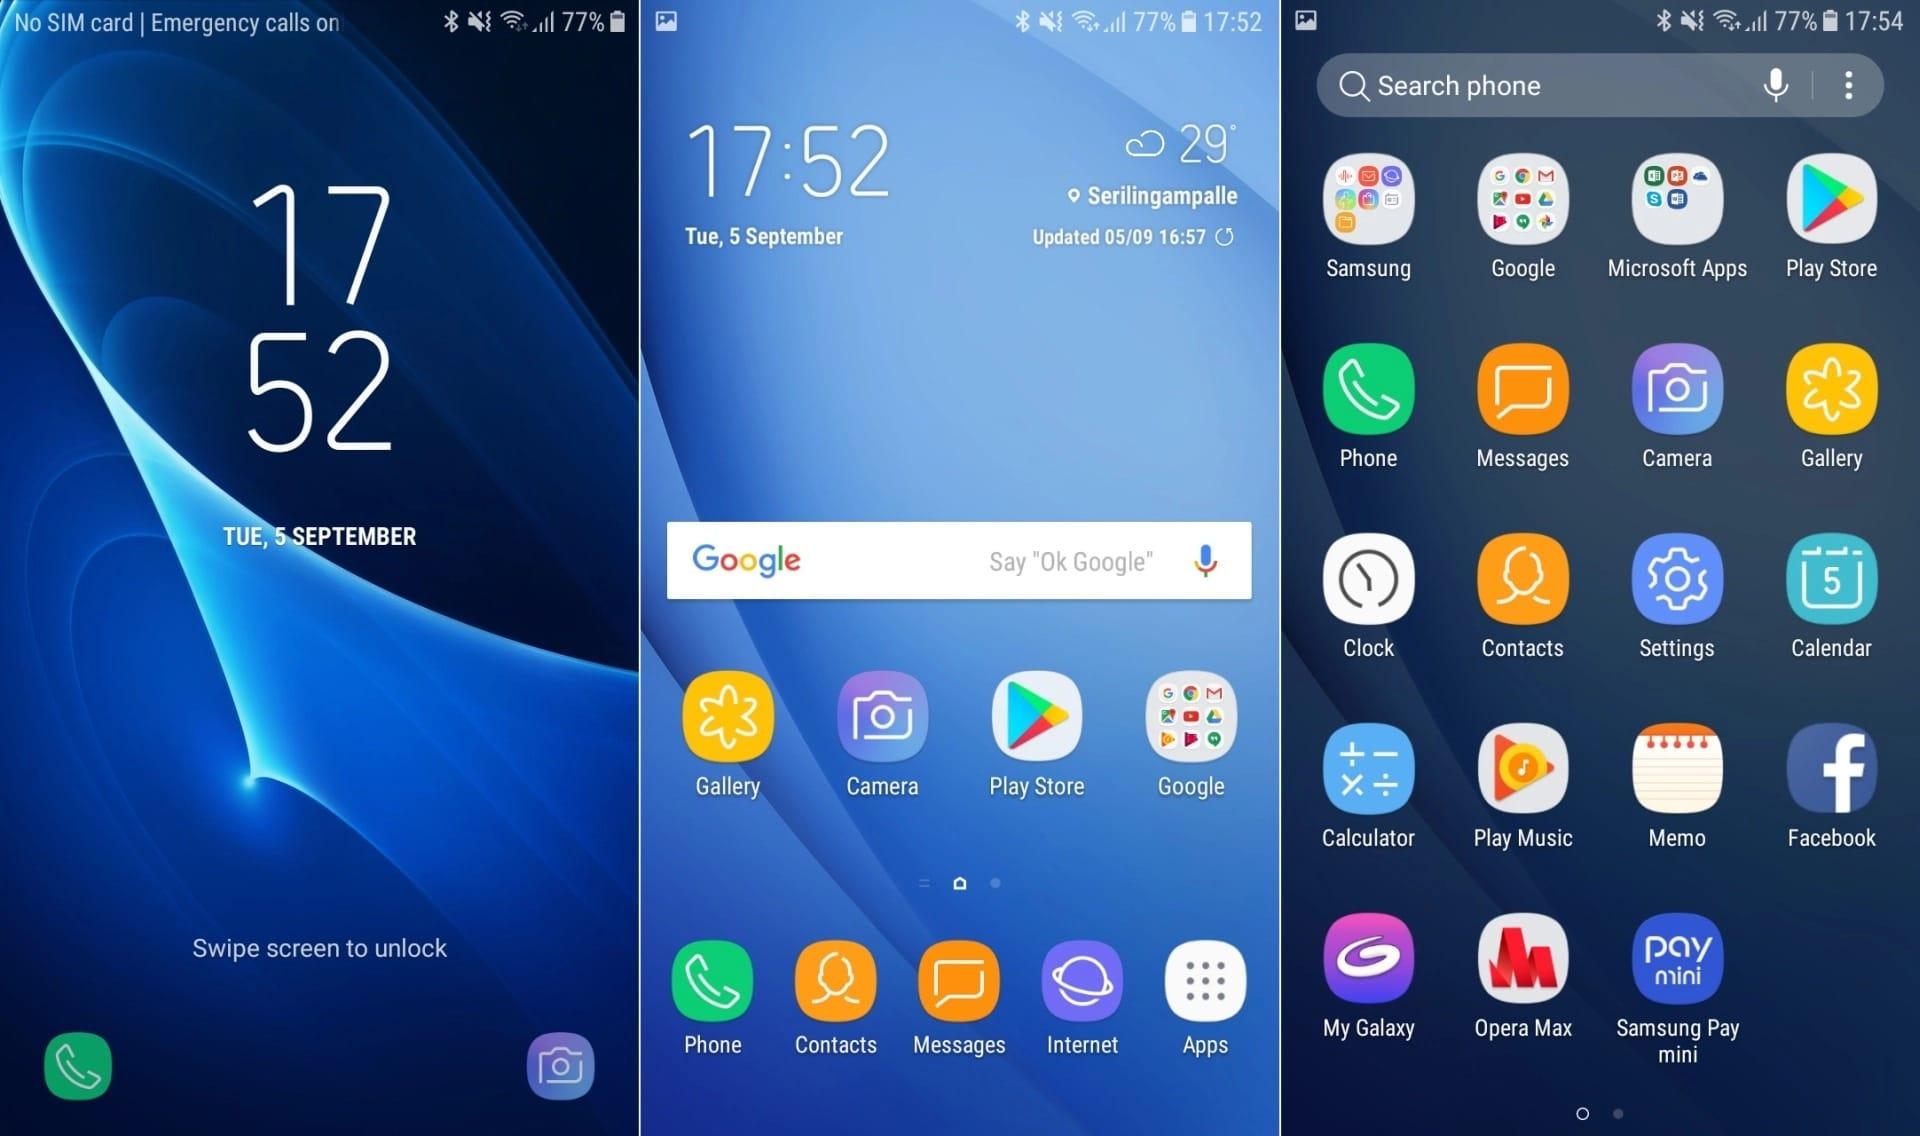 Смартфон Самсунг Galaxy S6 получит свежуюОС андроид Oreo